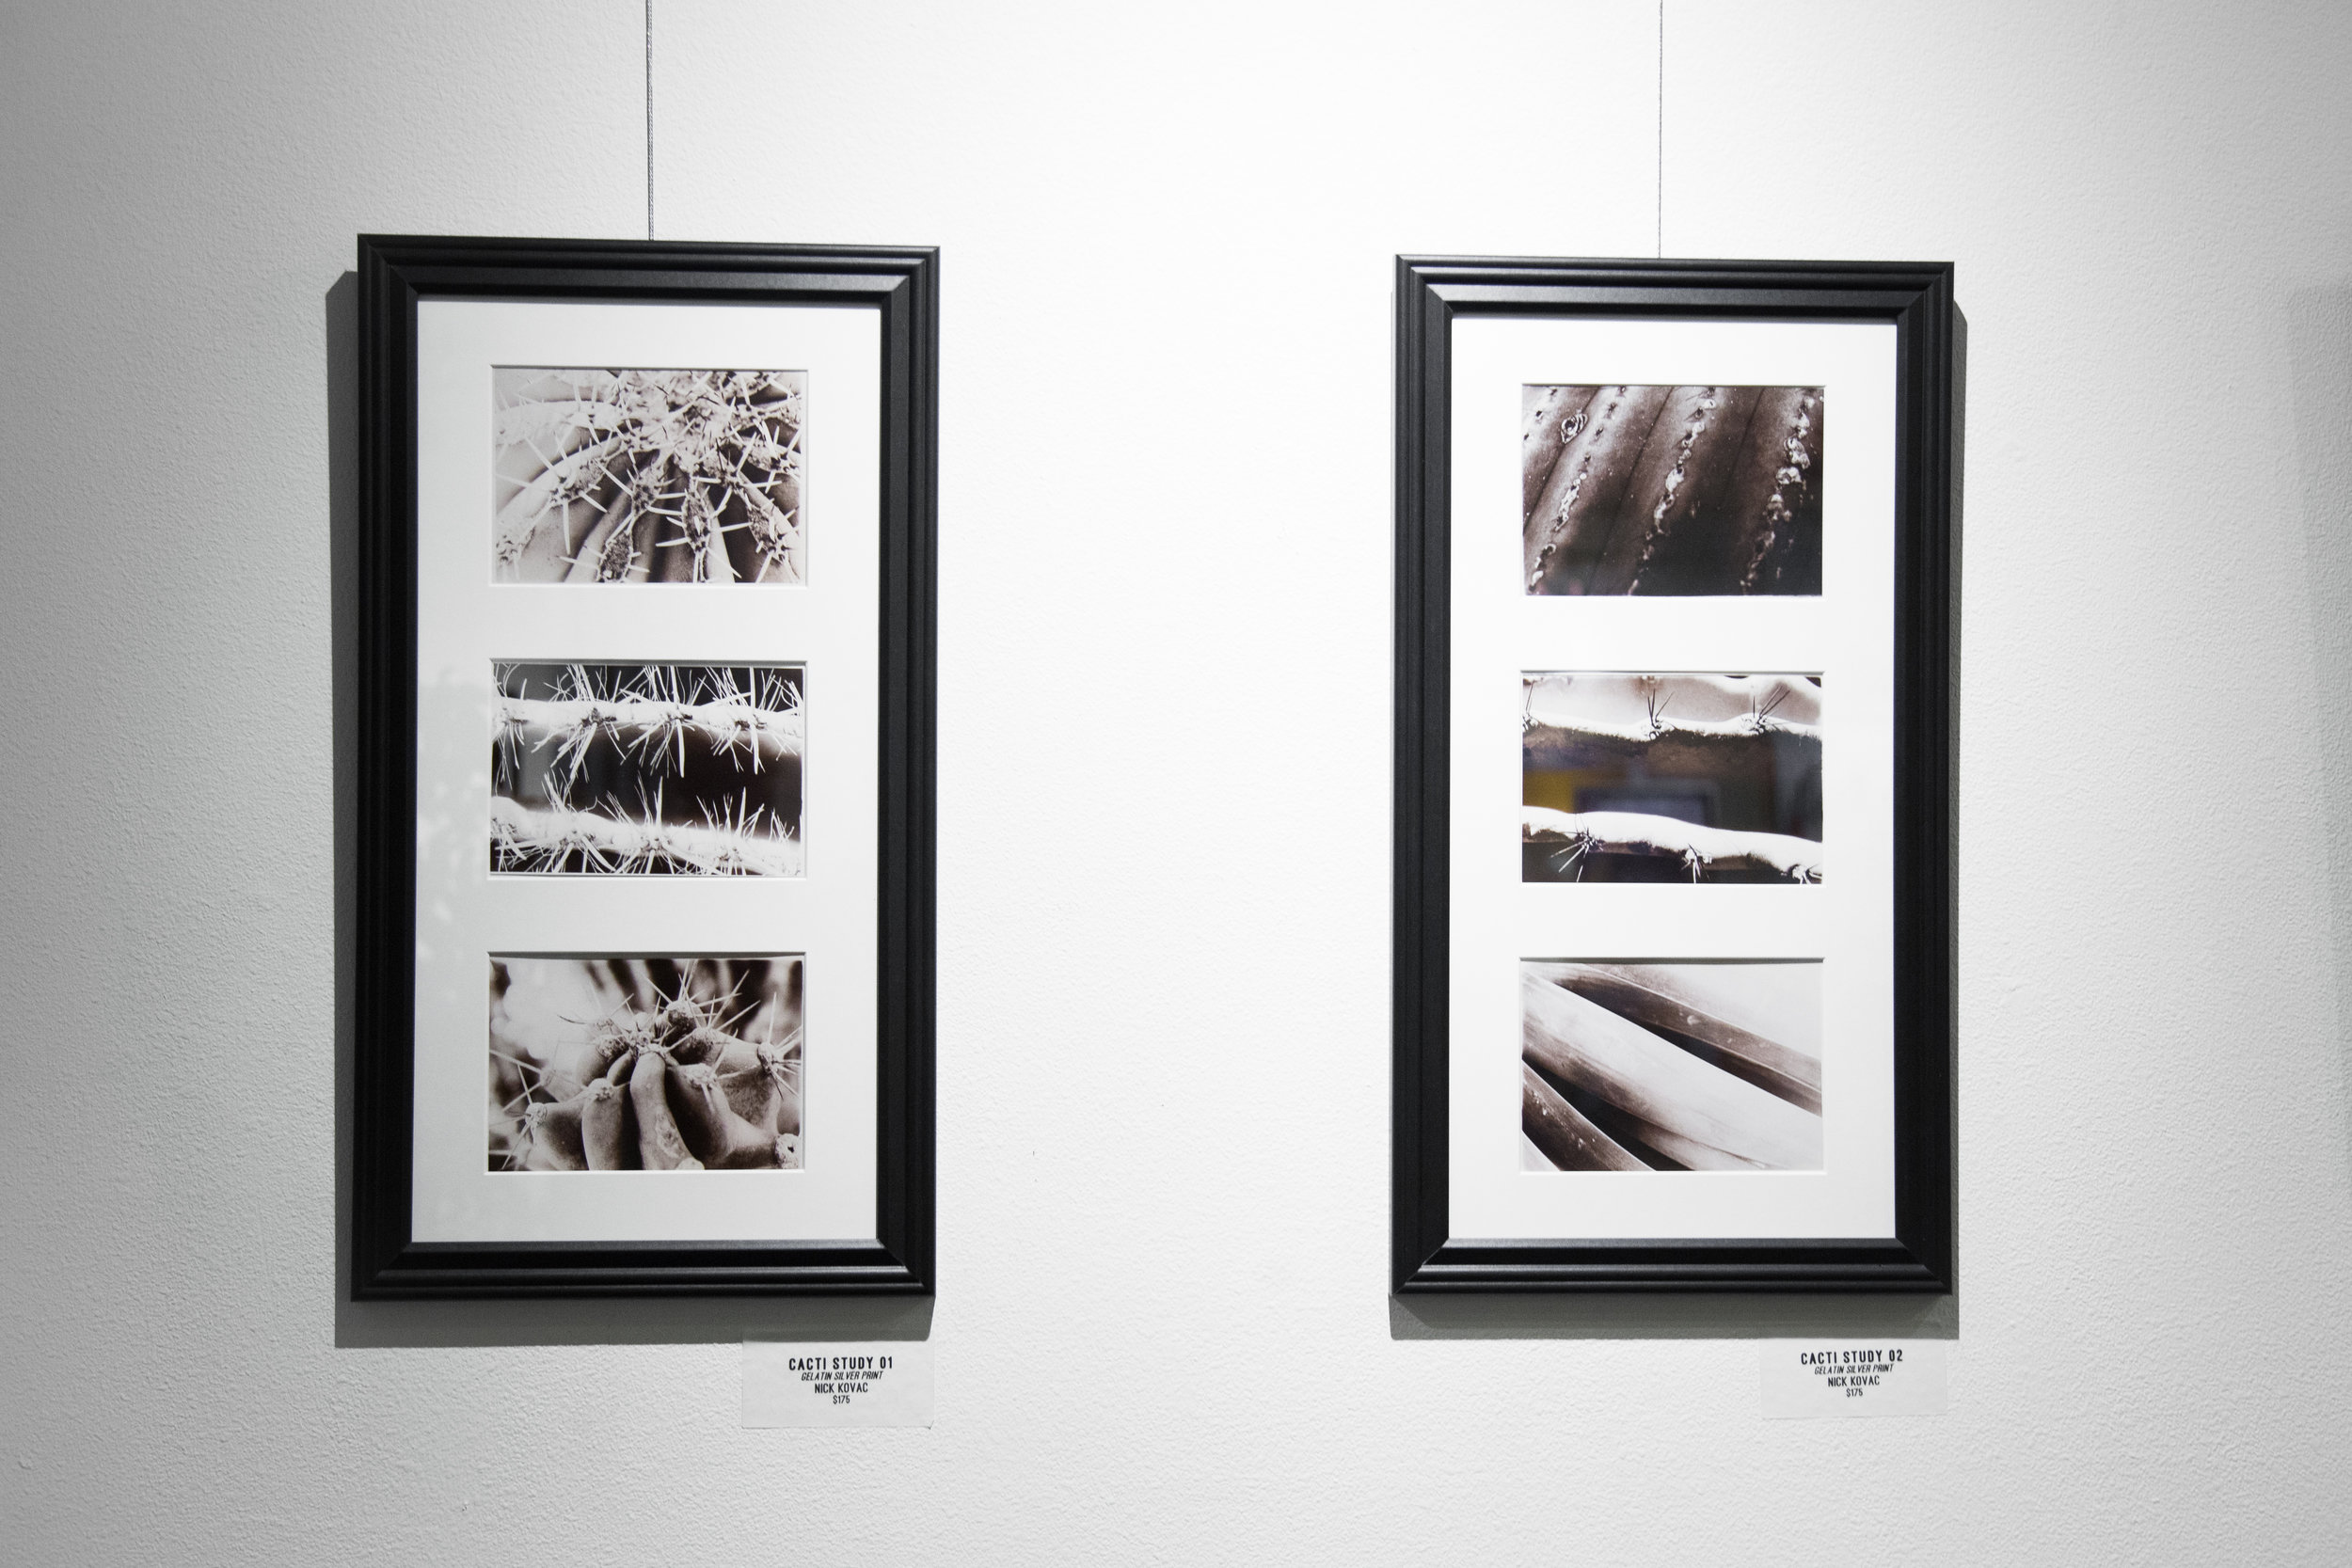 Cactus Study 01 &02  | gelatin silver prints  by Nick Kovac